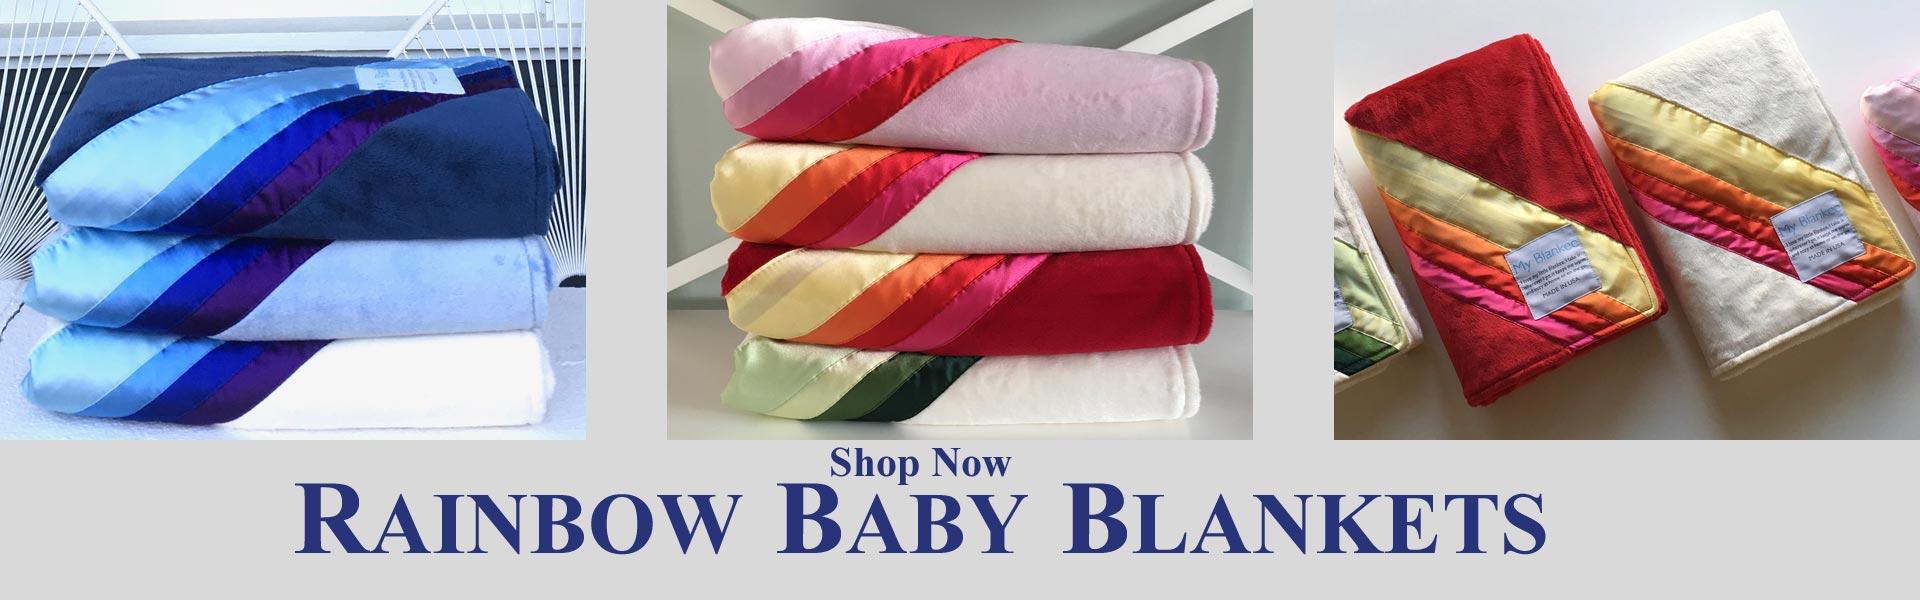 Rainbow Baby Blankets